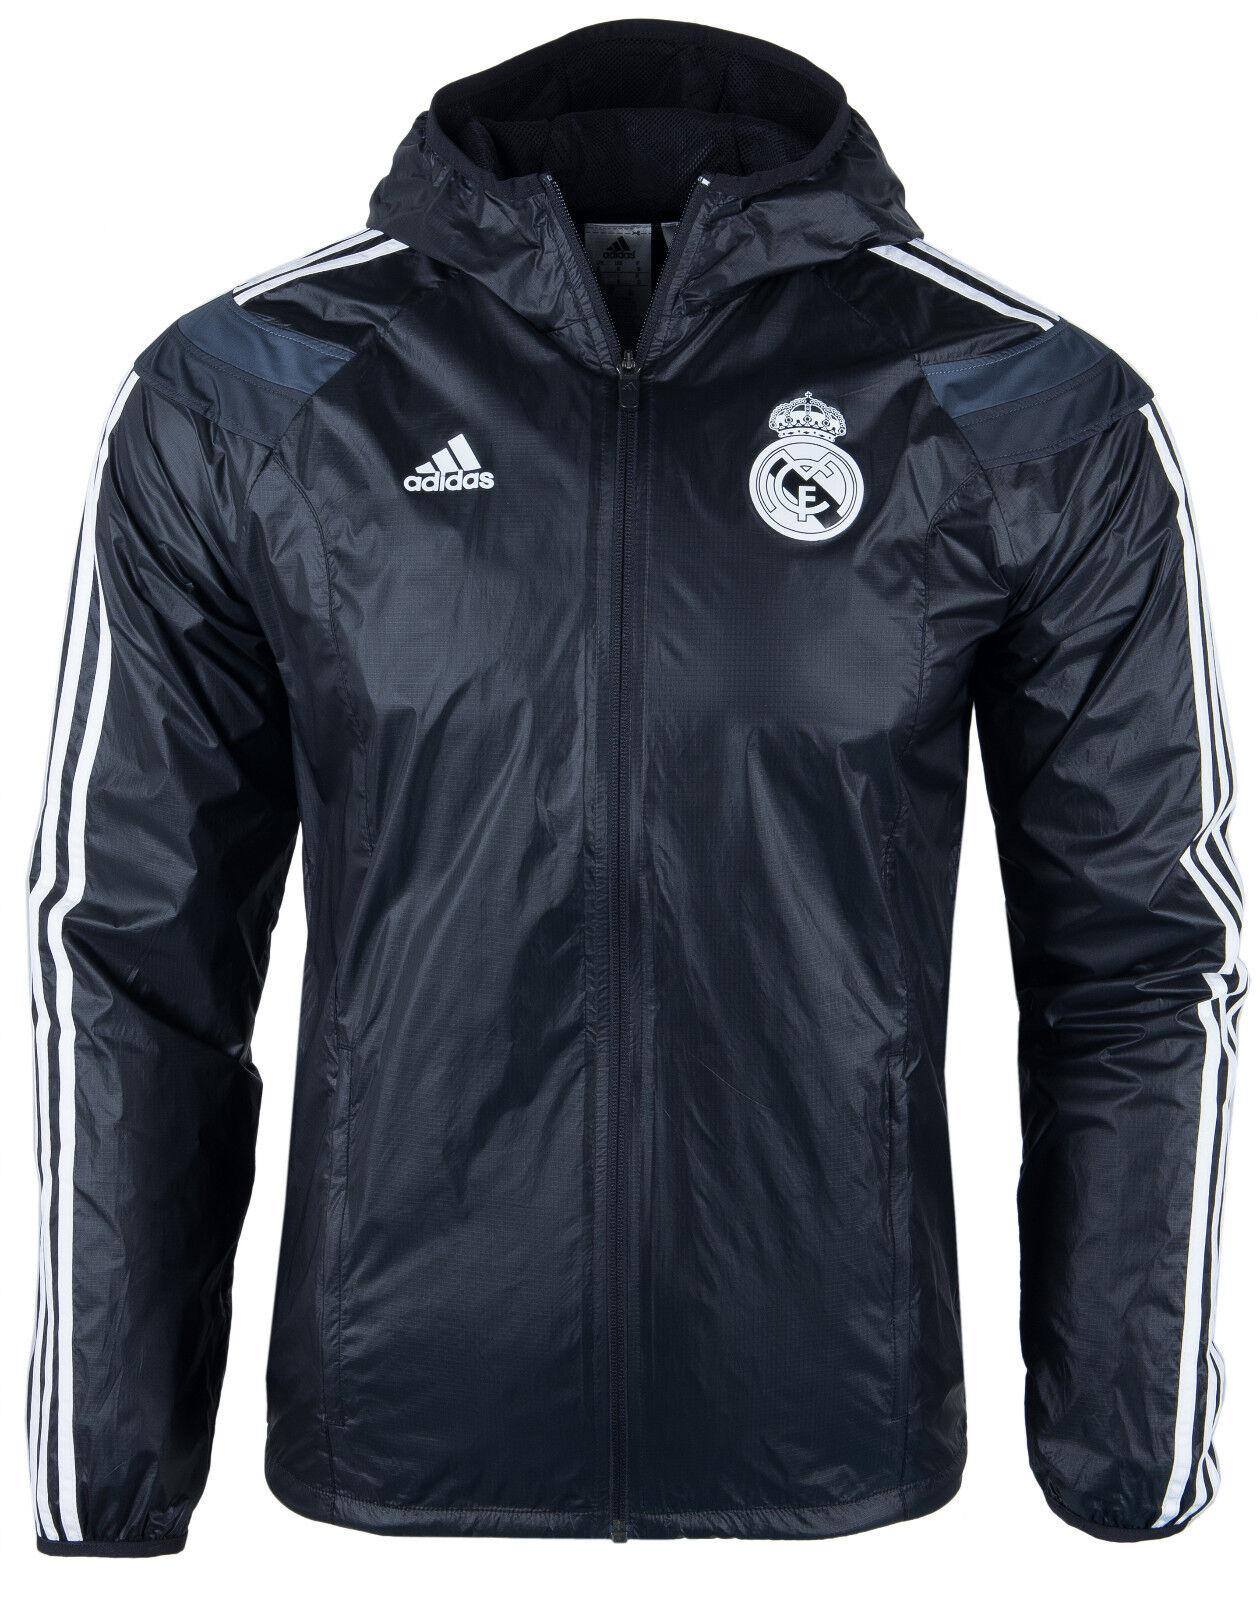 ADIDAS FC REAL MADRID OFFIZIELL LIZENZIERTE WINDBREAKER JACKET XL